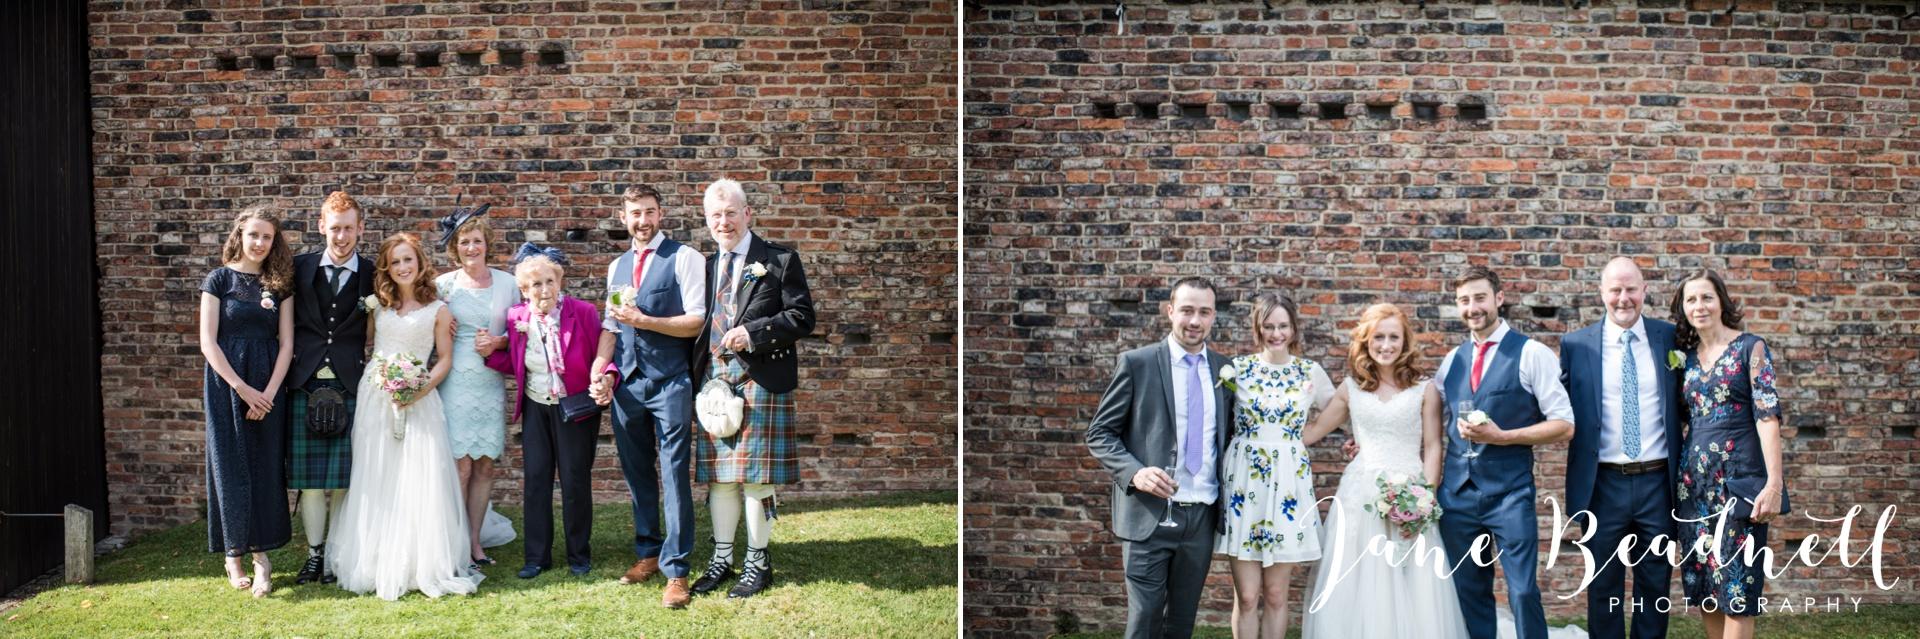 yorkshire-fine-art-wedding-photographer-jane-beadnell-photography-poppleton-york_0098